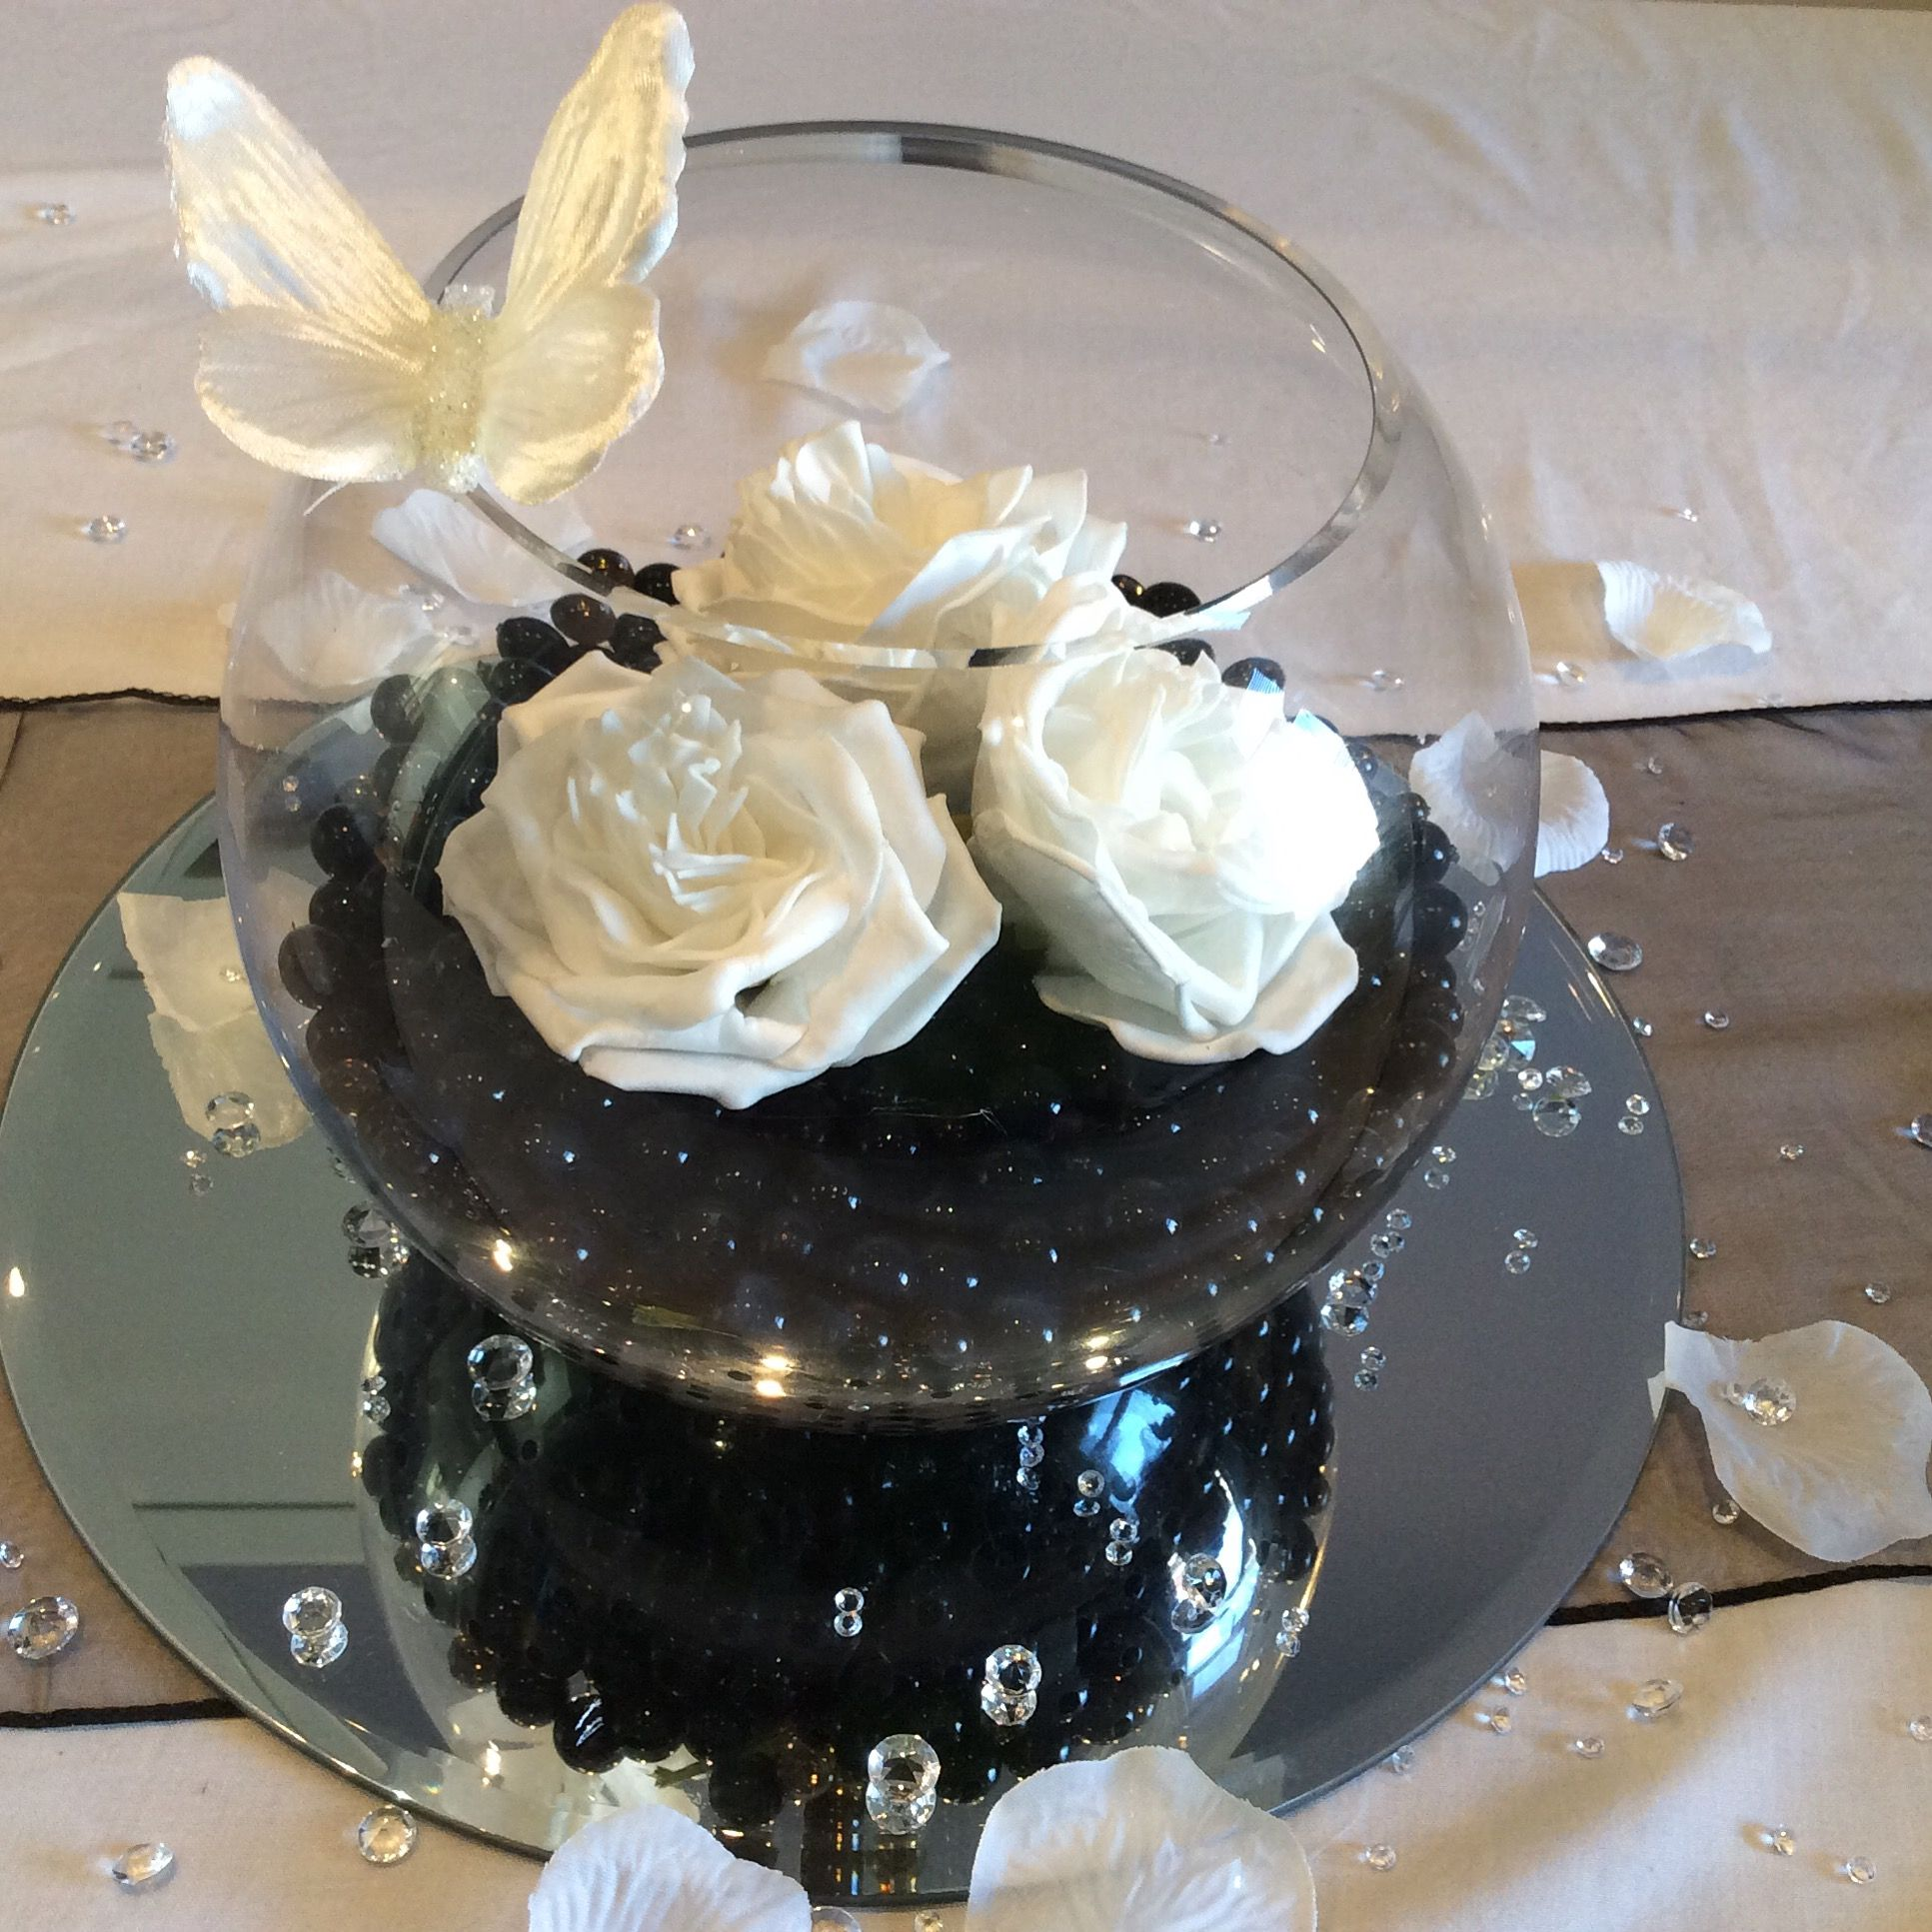 Fish Bowl Wedding Centrepiece Ideas: Fish Bowl Wedding Centrepiece For Black Themed Weddings